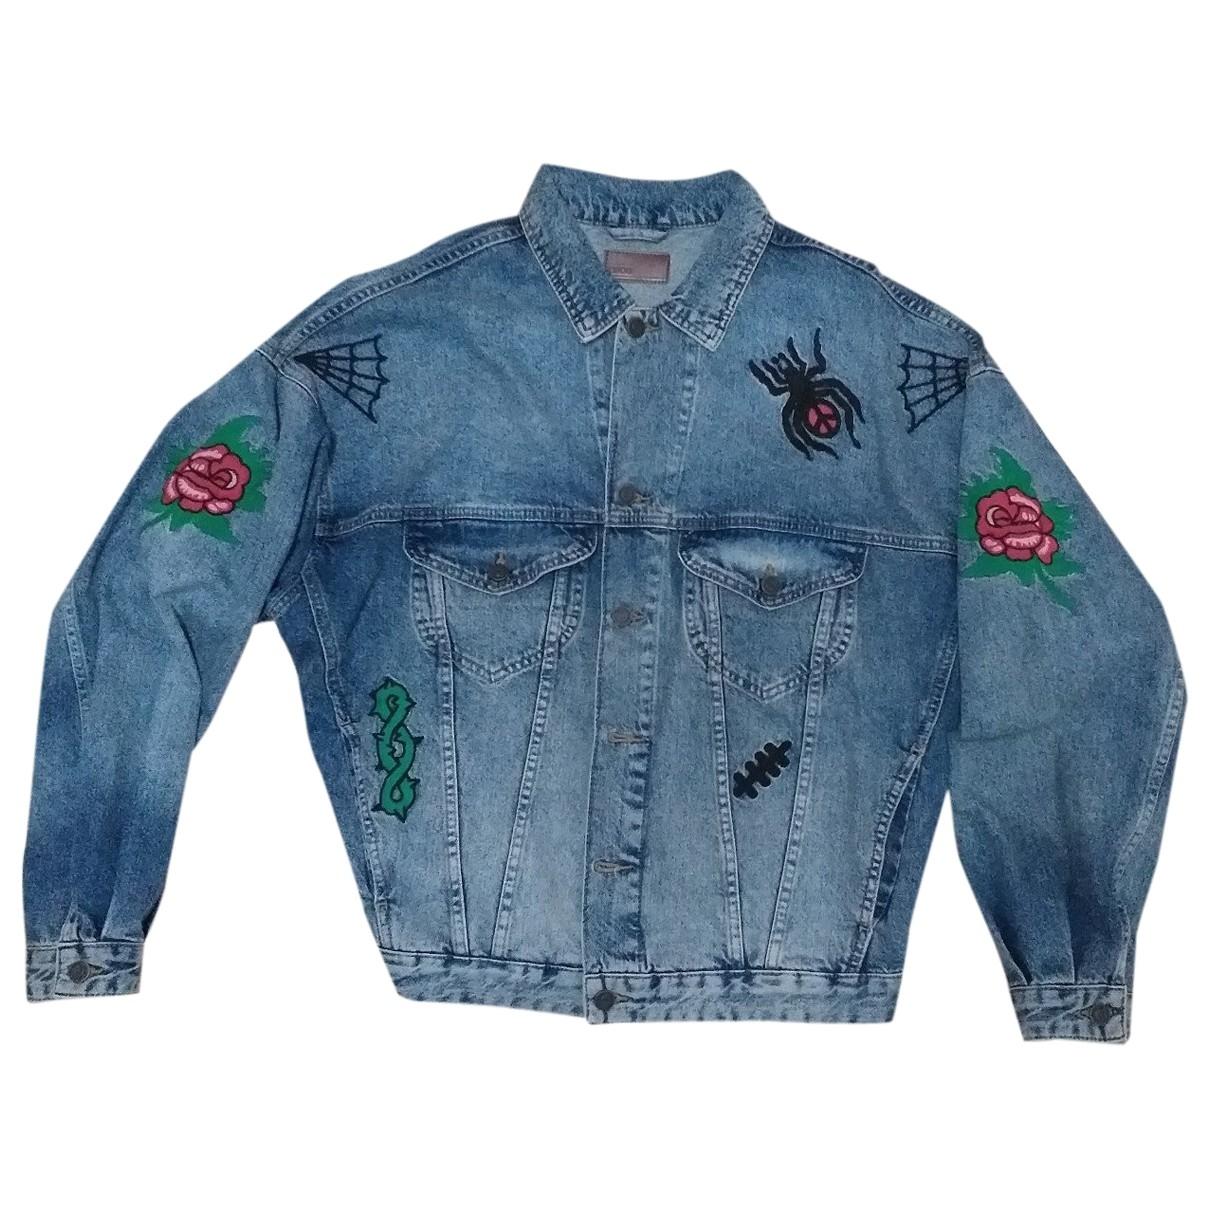 Asos \N Blue Cotton jacket for Women M International